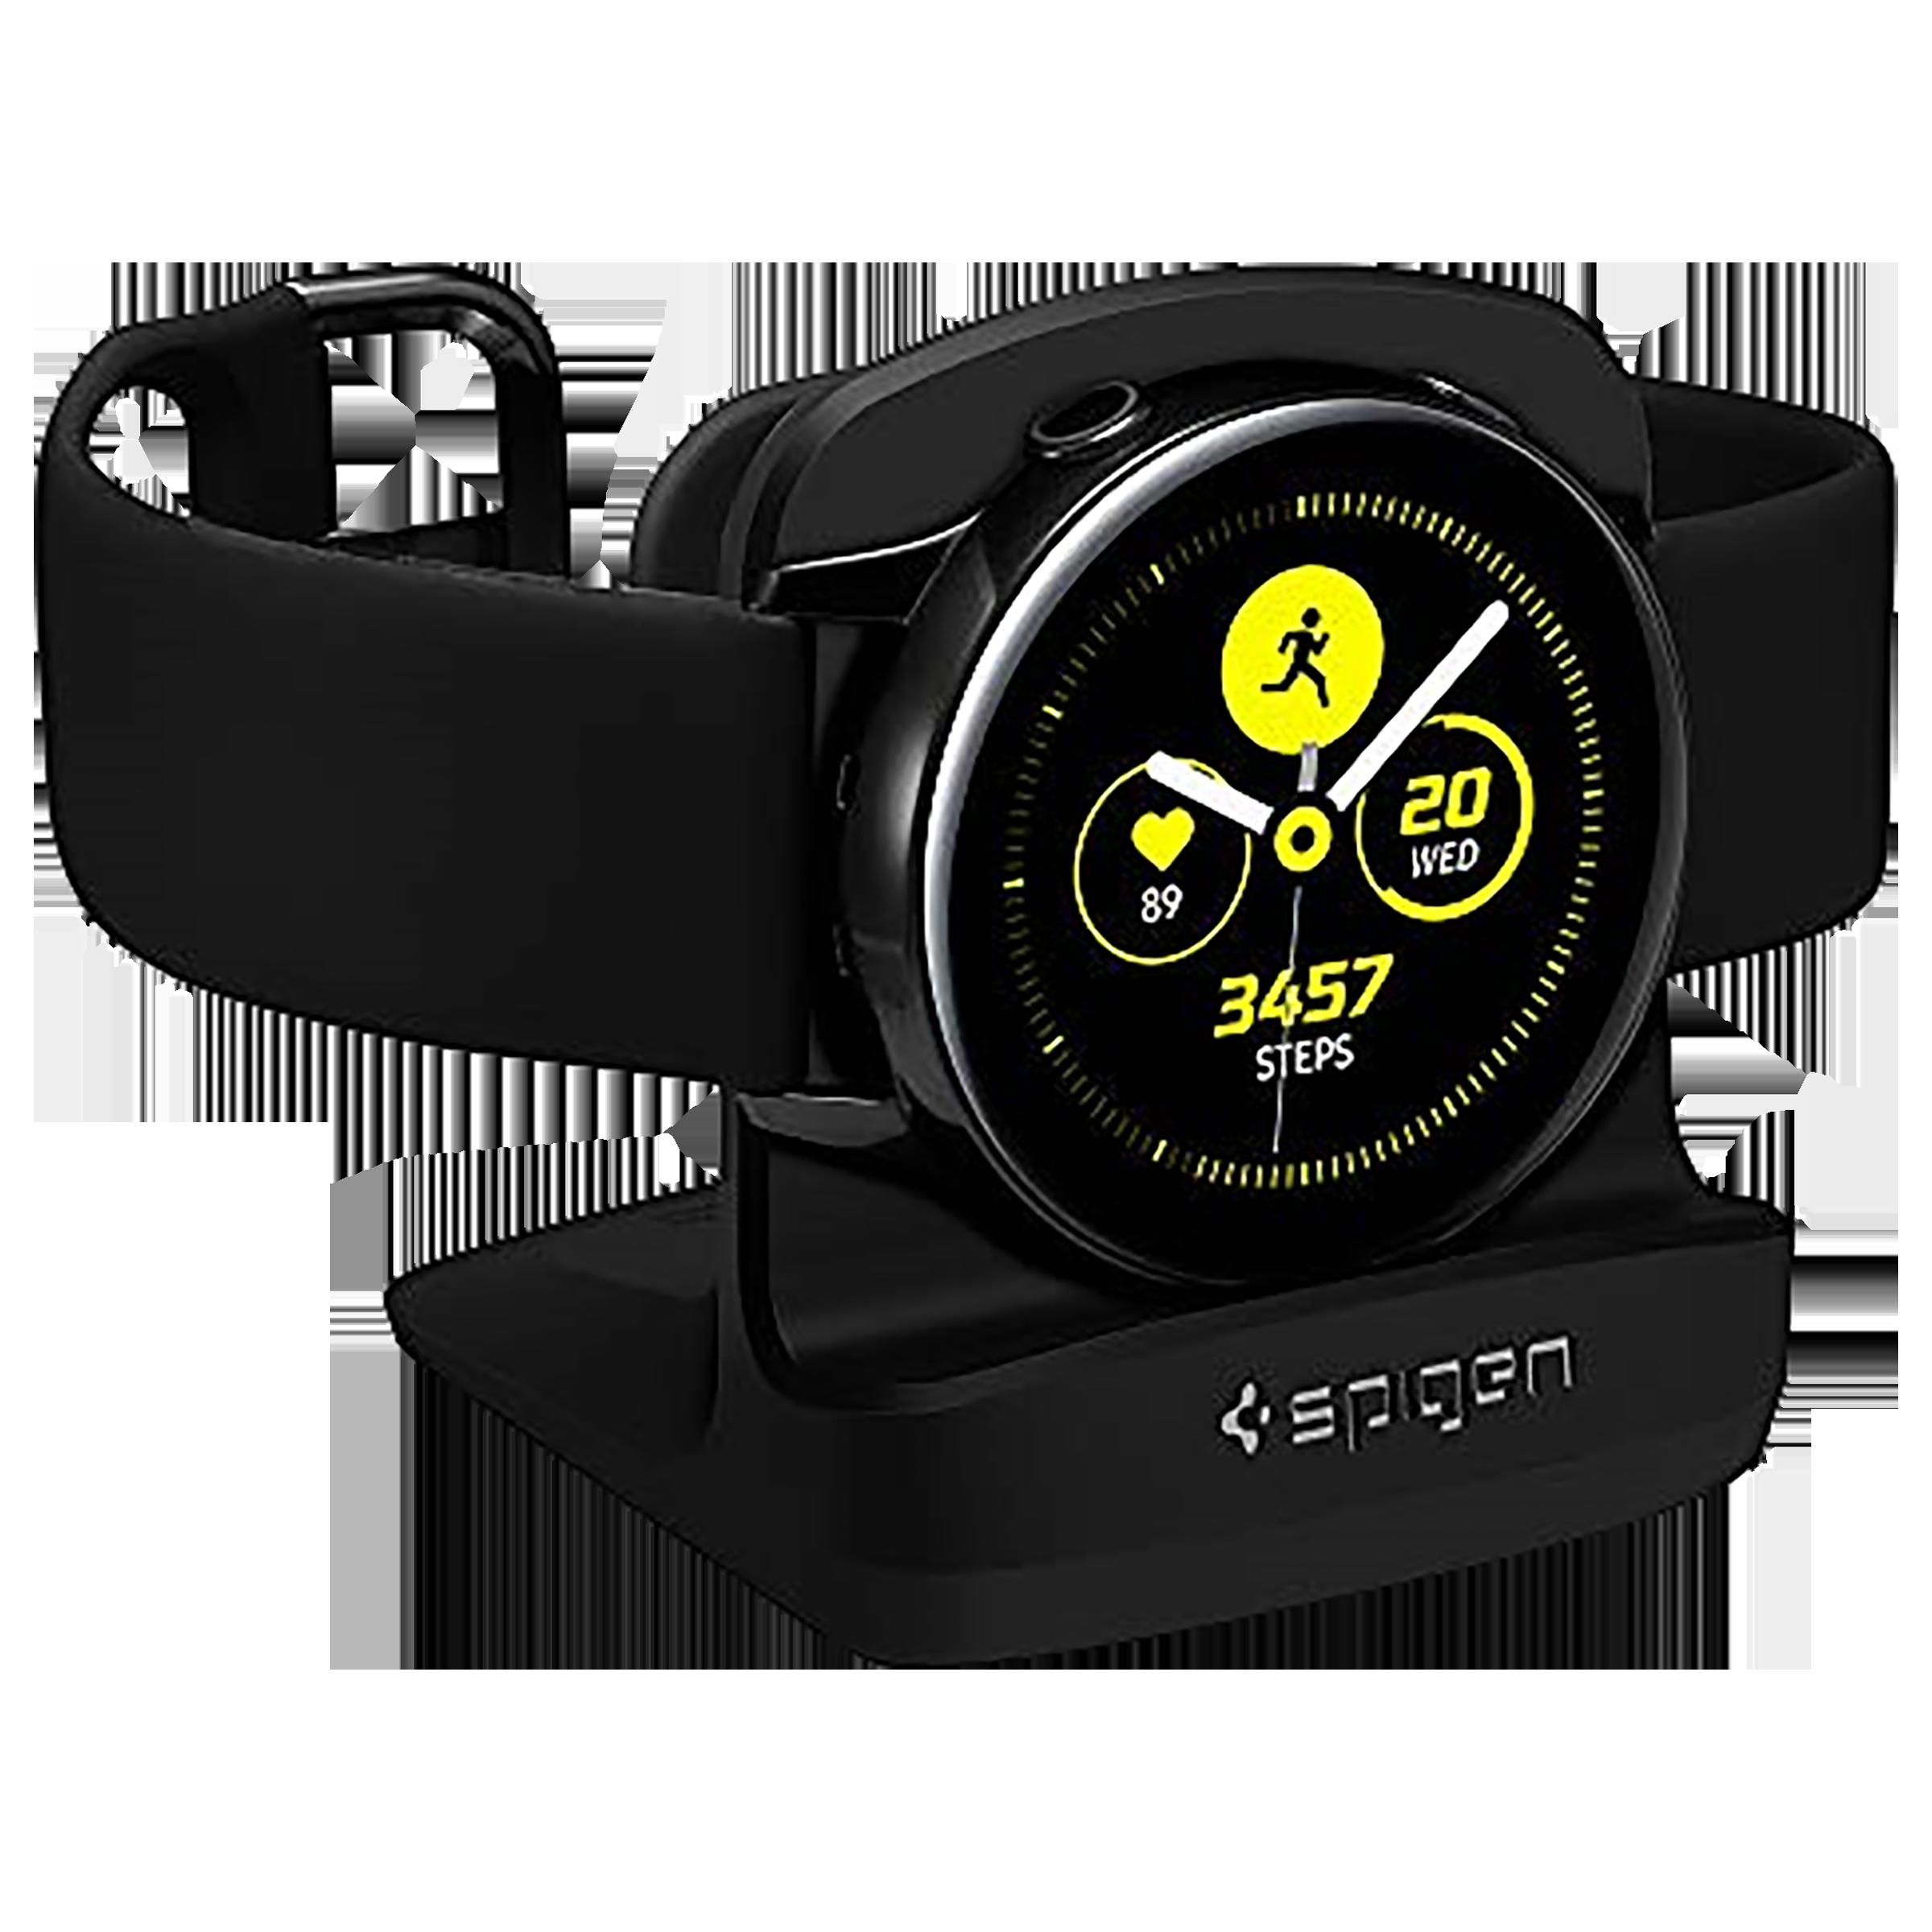 Spigen S351 Night Stand Dock For Samsung Galaxy Watch Active (44mm/40mm) (616MP26284, Black)_1